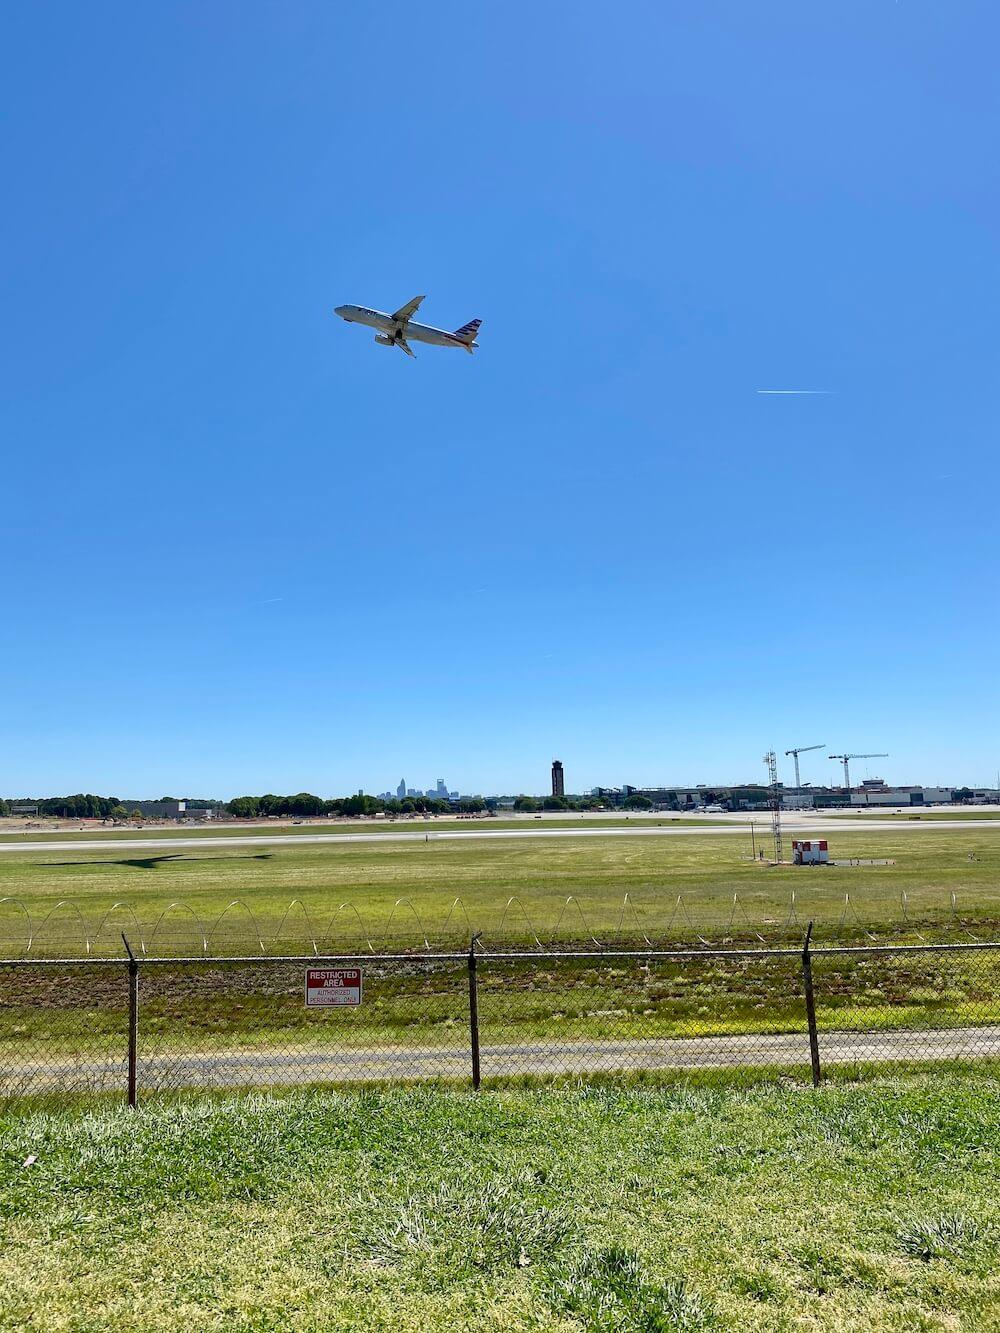 Charlotte airport overlook park